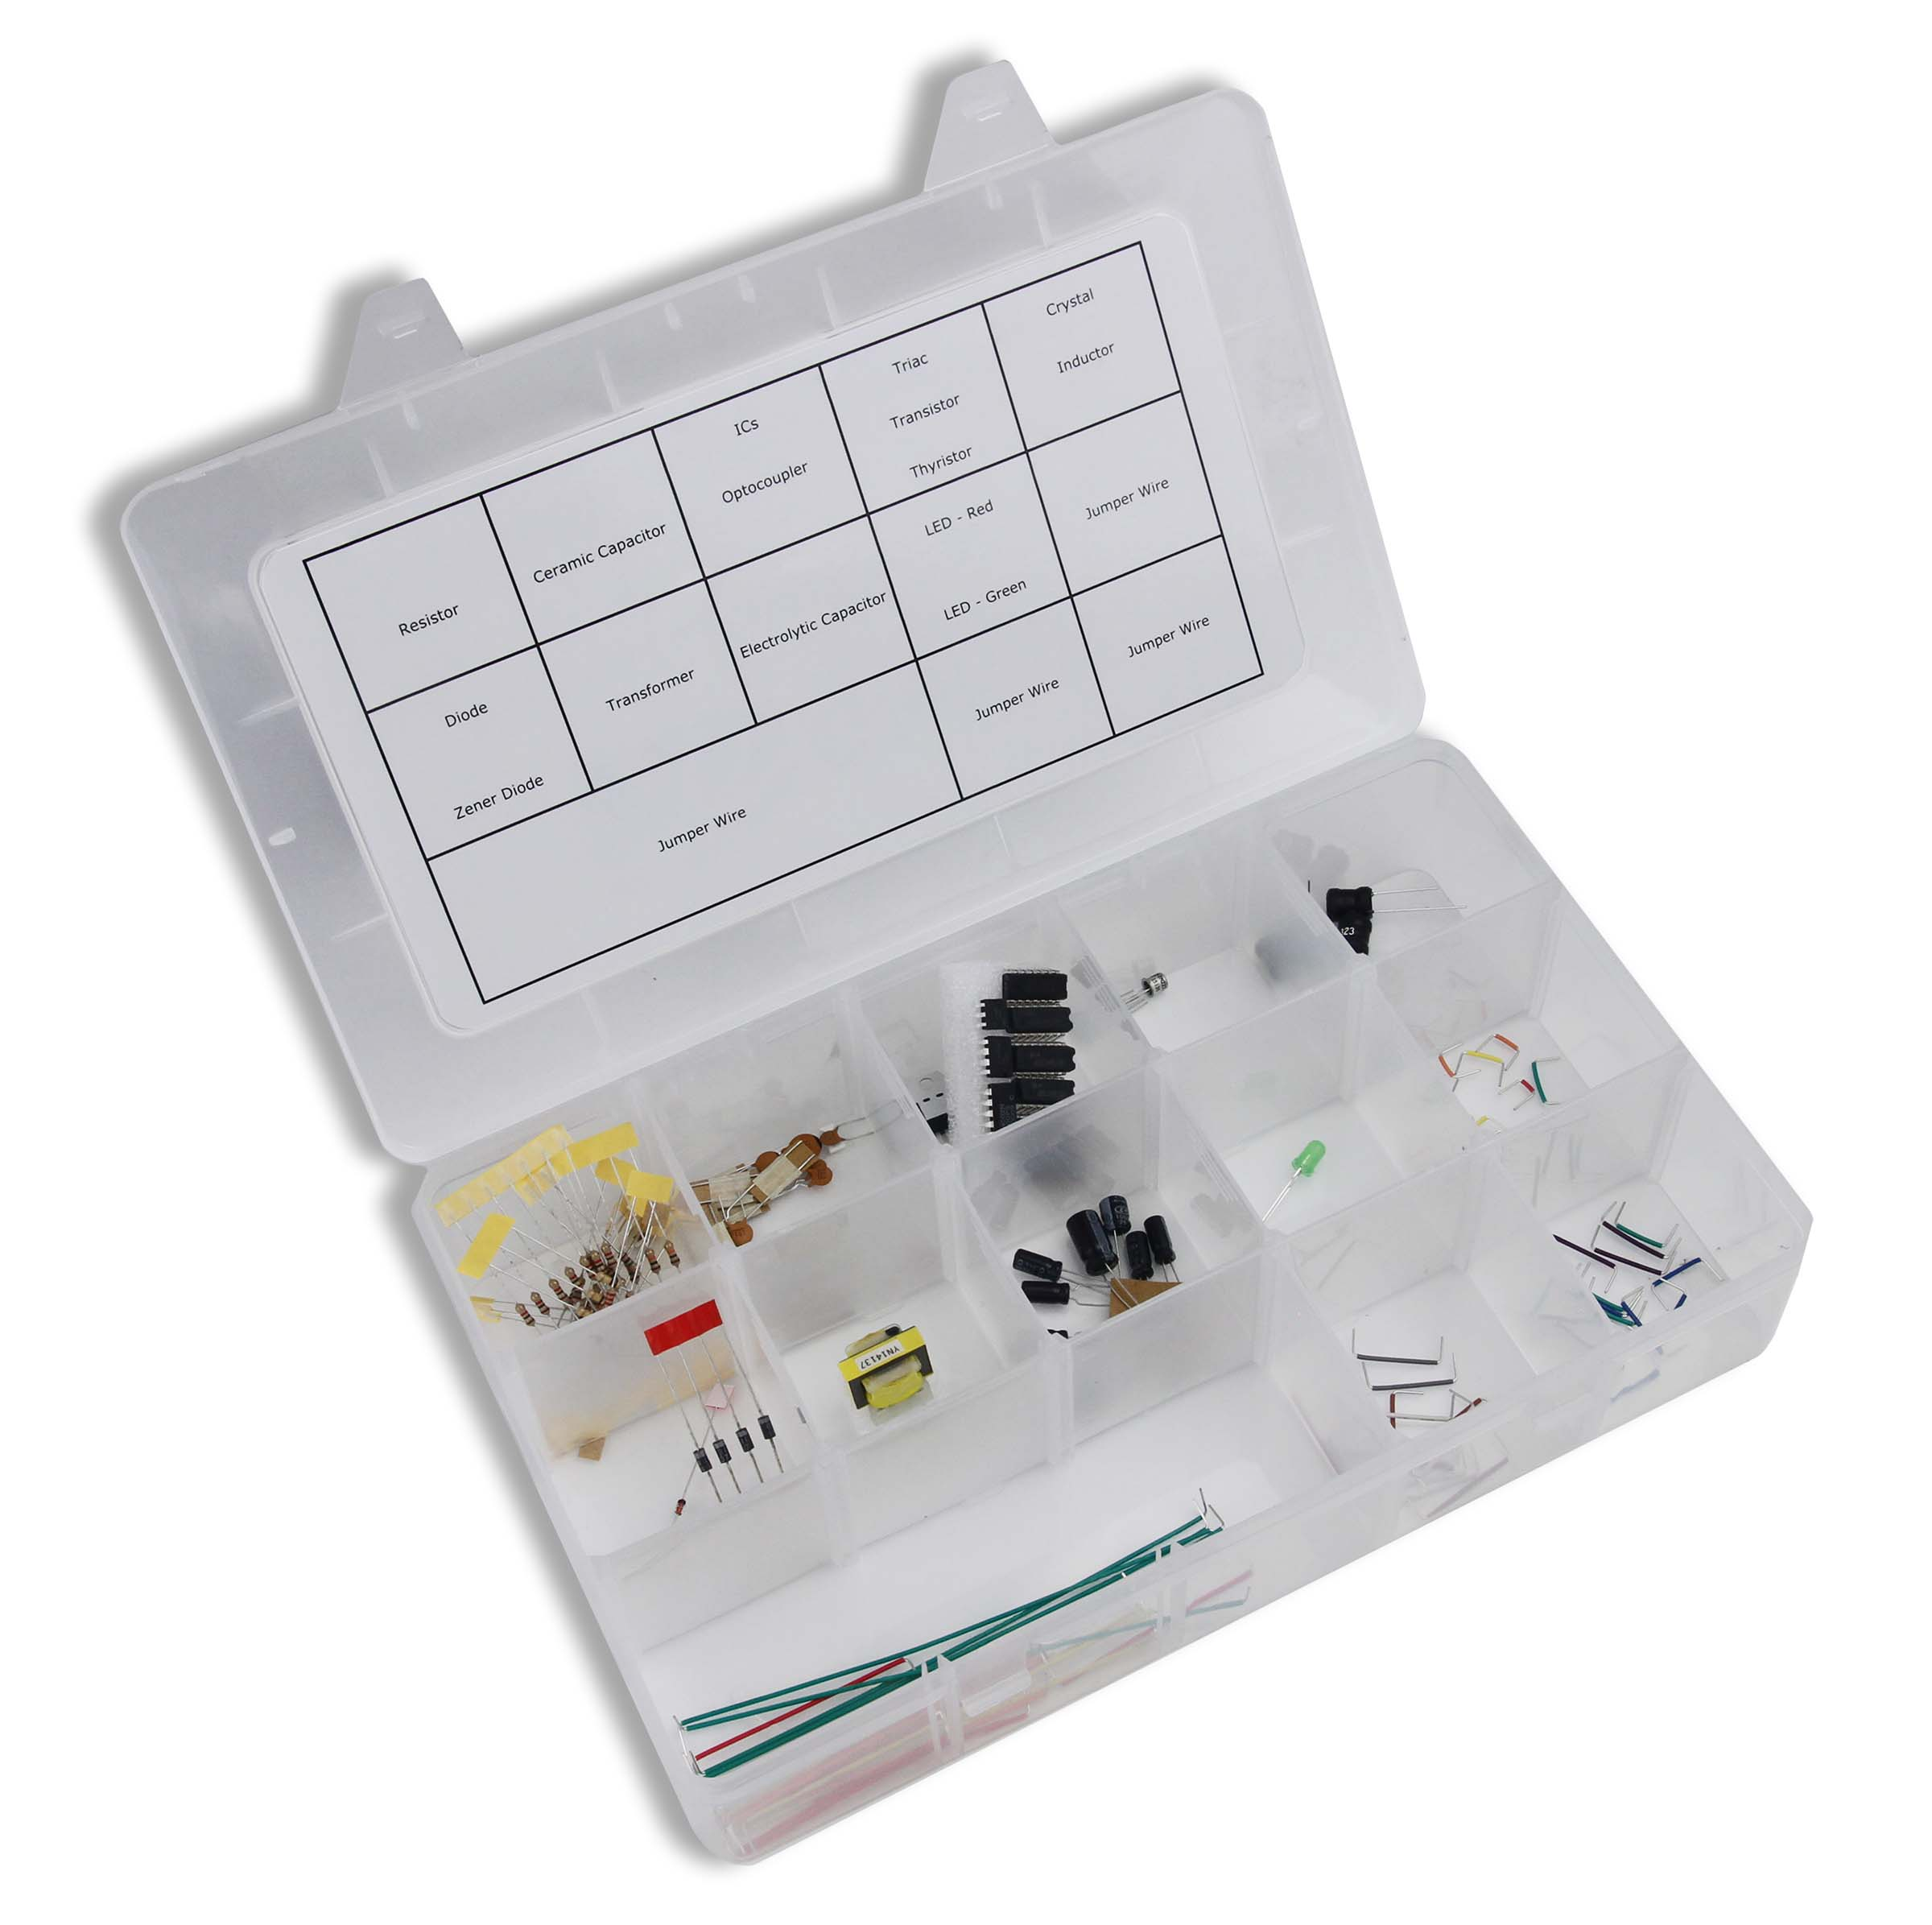 Global Specialties PB-503CLAB PB-503C Plus Courseware & Kit Photo